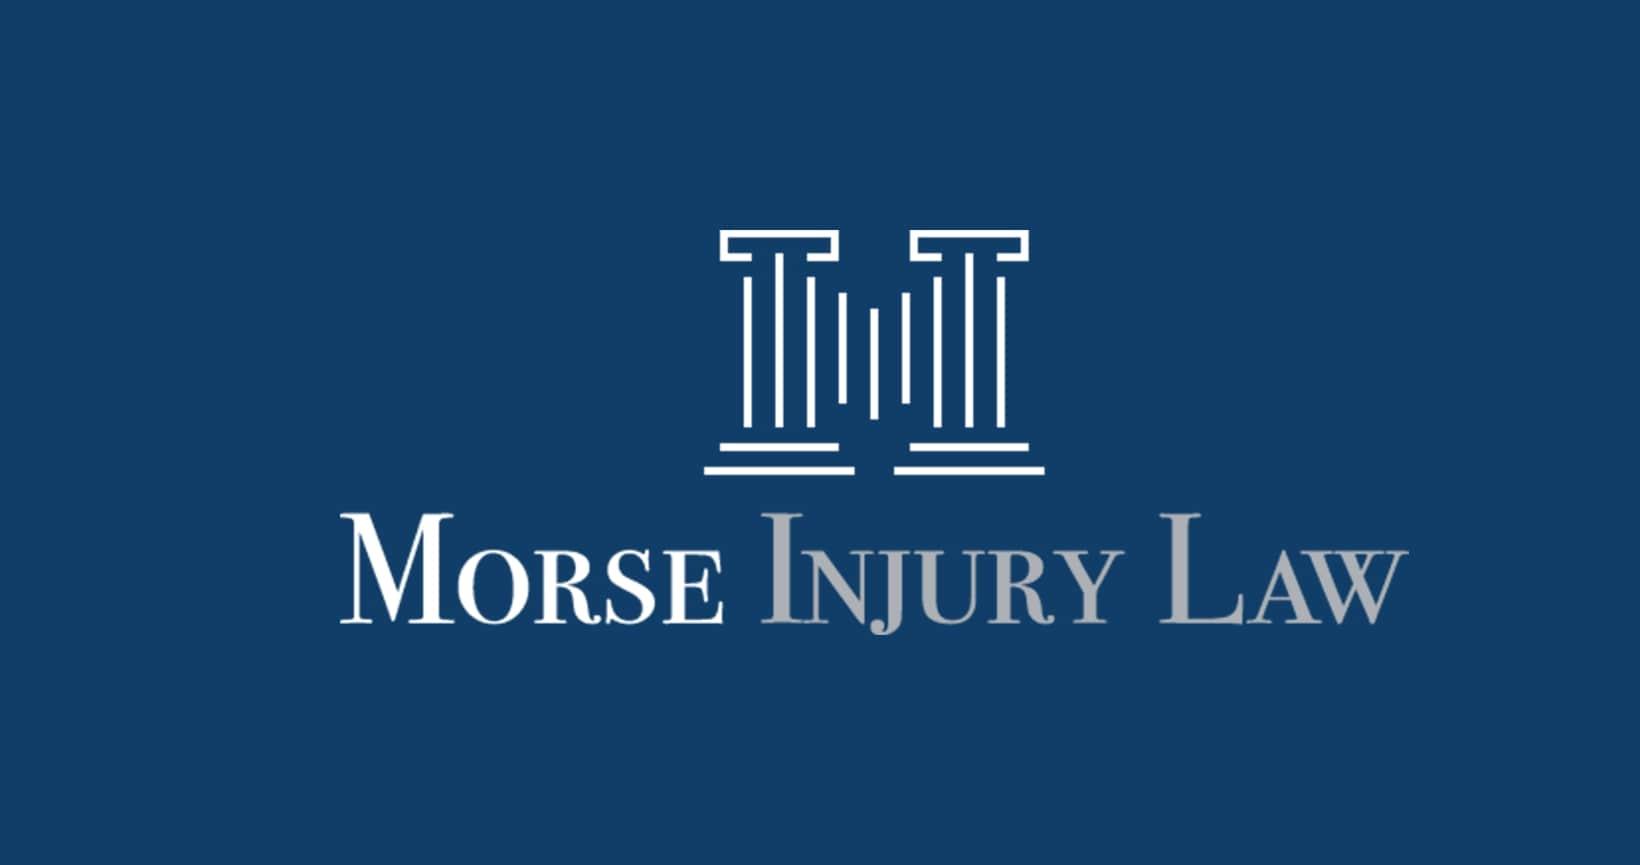 Morse Injury Law Profile Picture